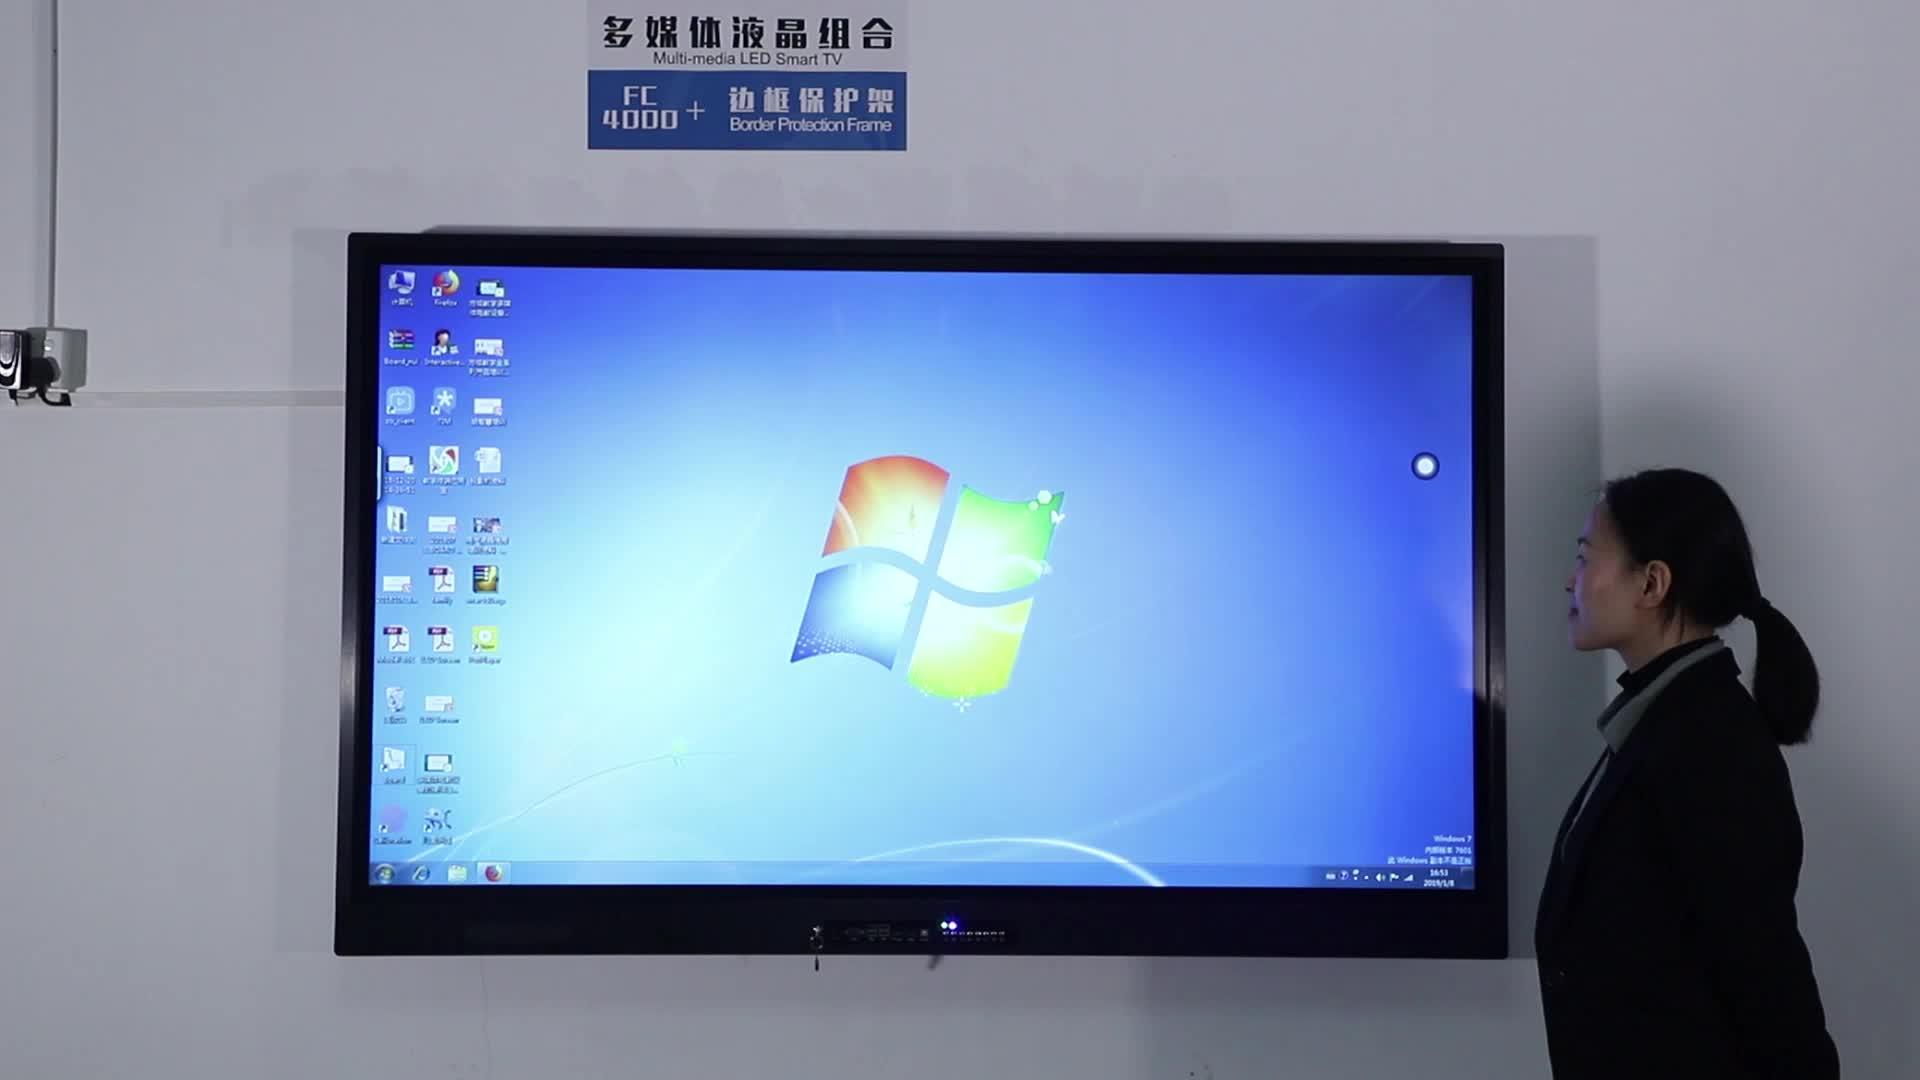 Toptan İnteraktif Düz Panel Dokunmatik Ekran Monitör LED LCD Akıllı TV